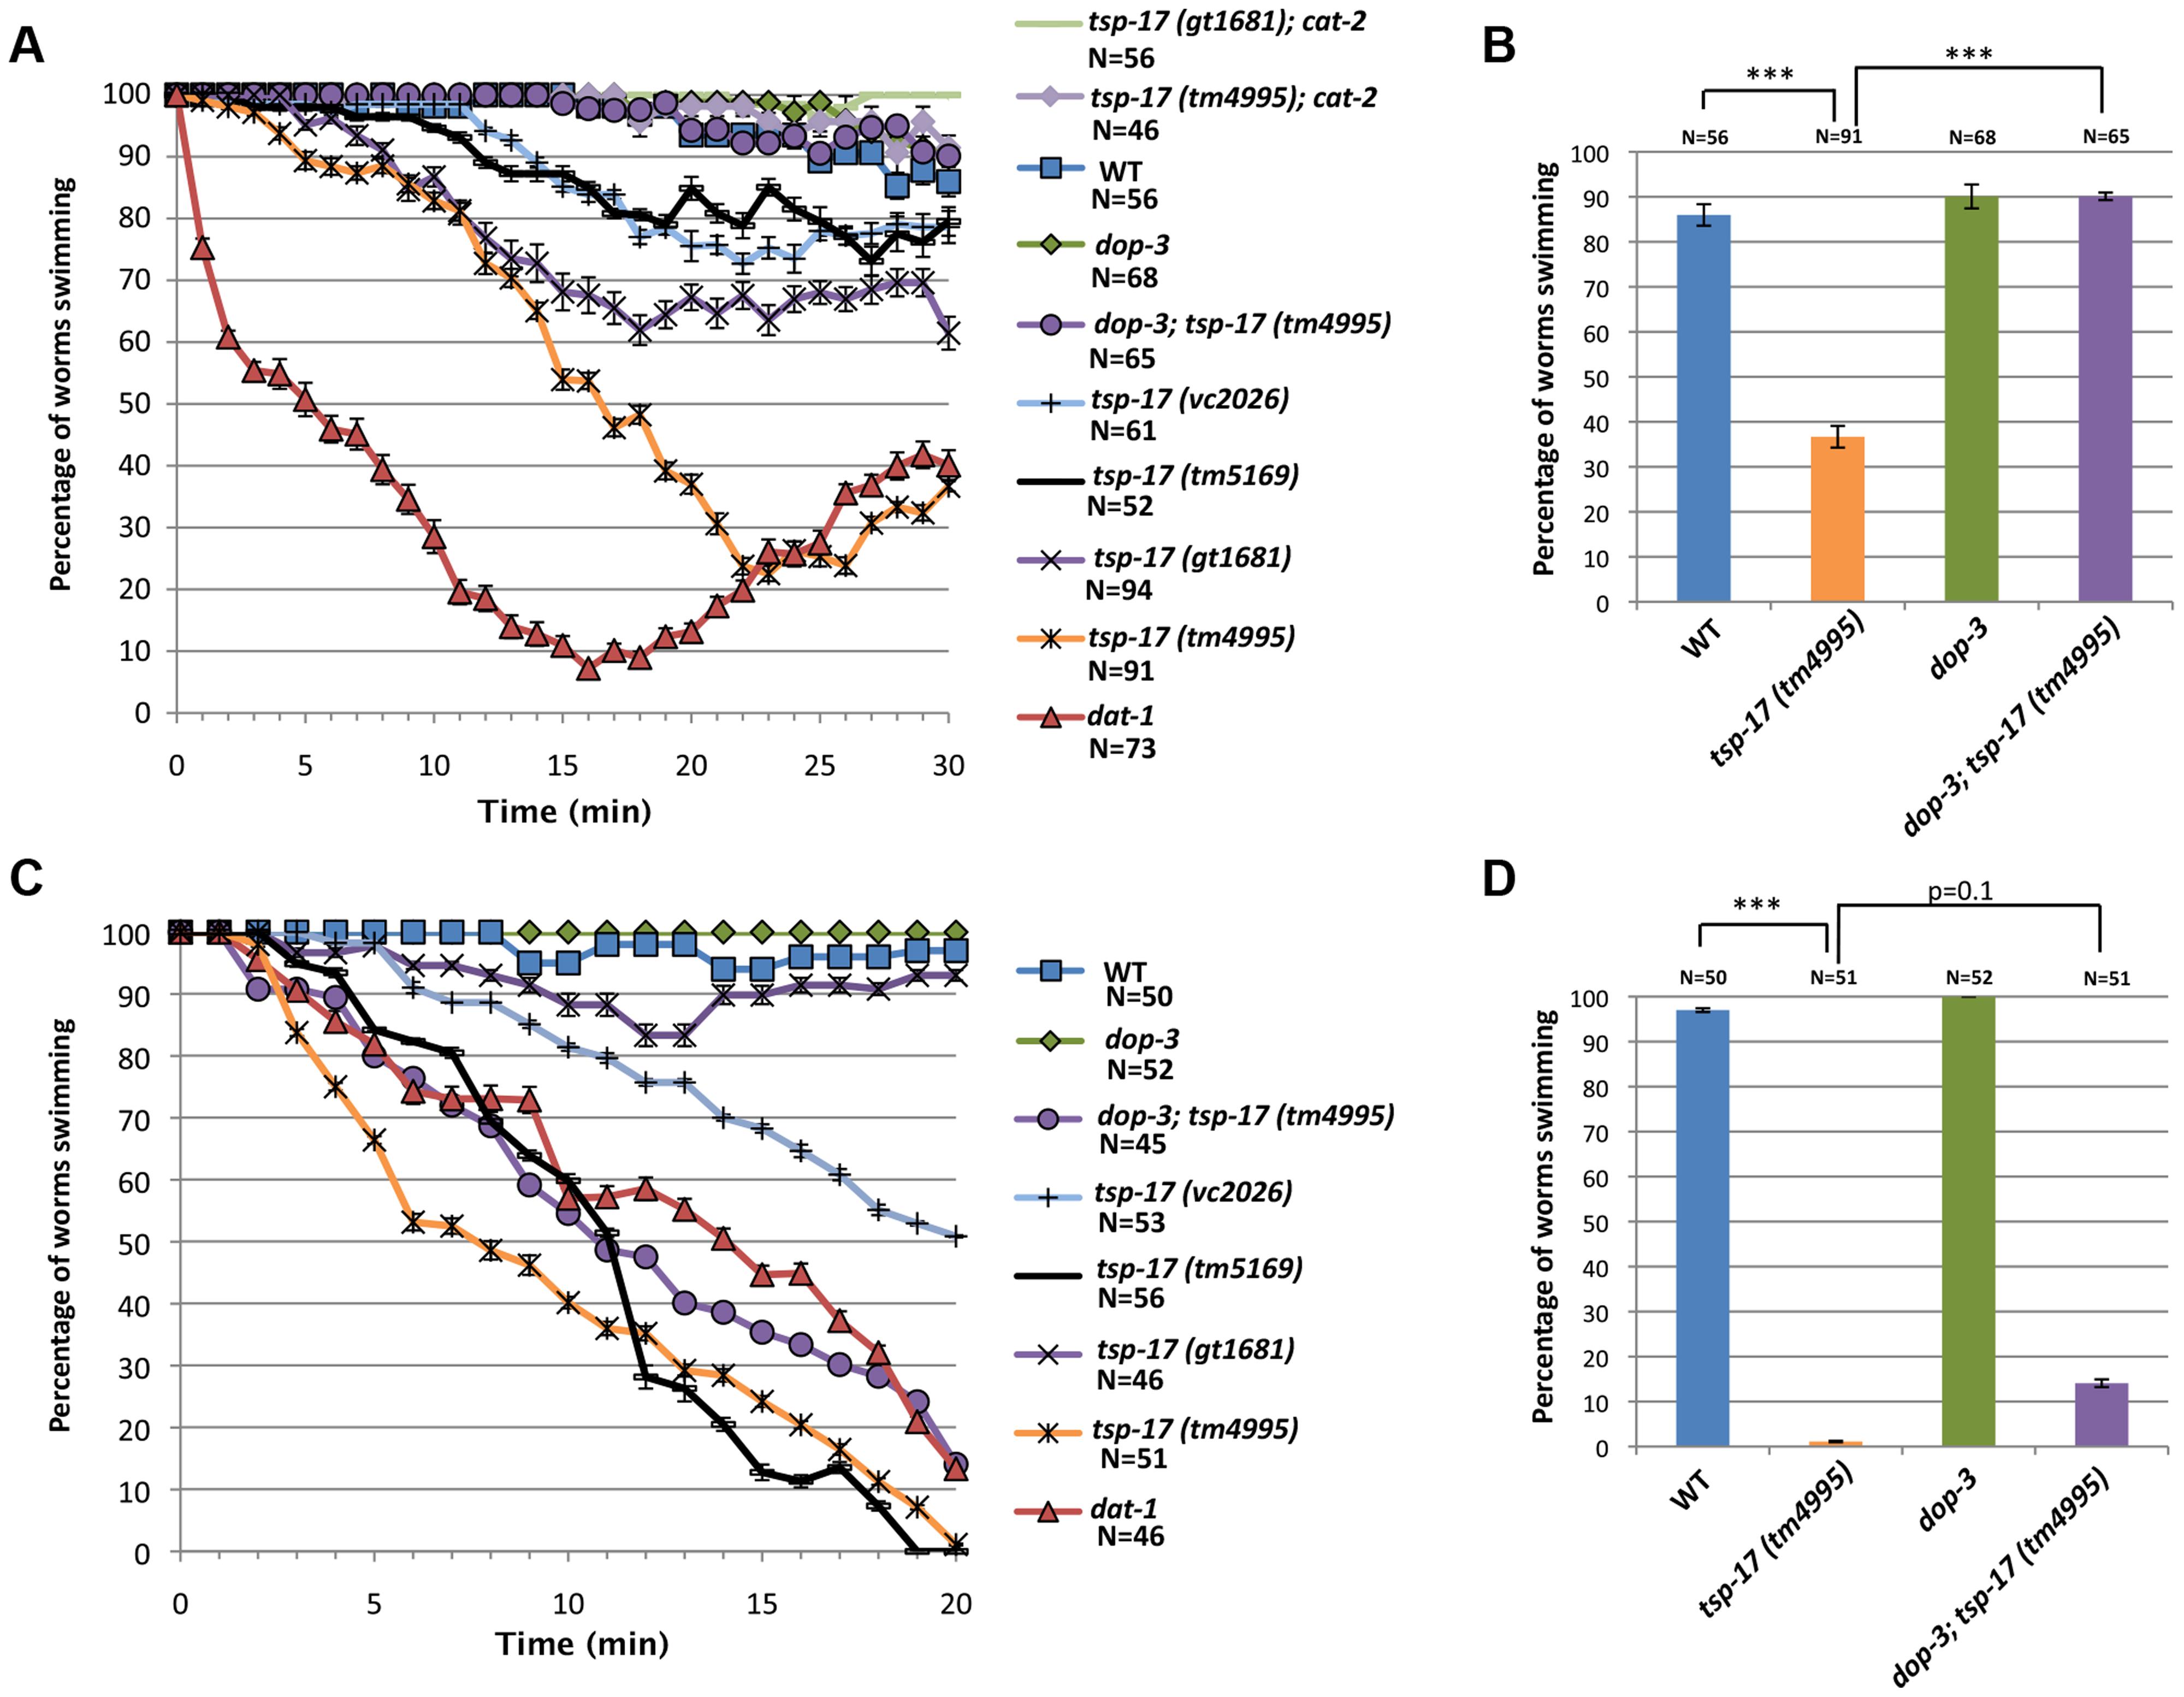 Behavioral phenotypes associated with <i>tsp-17</i> mutants.